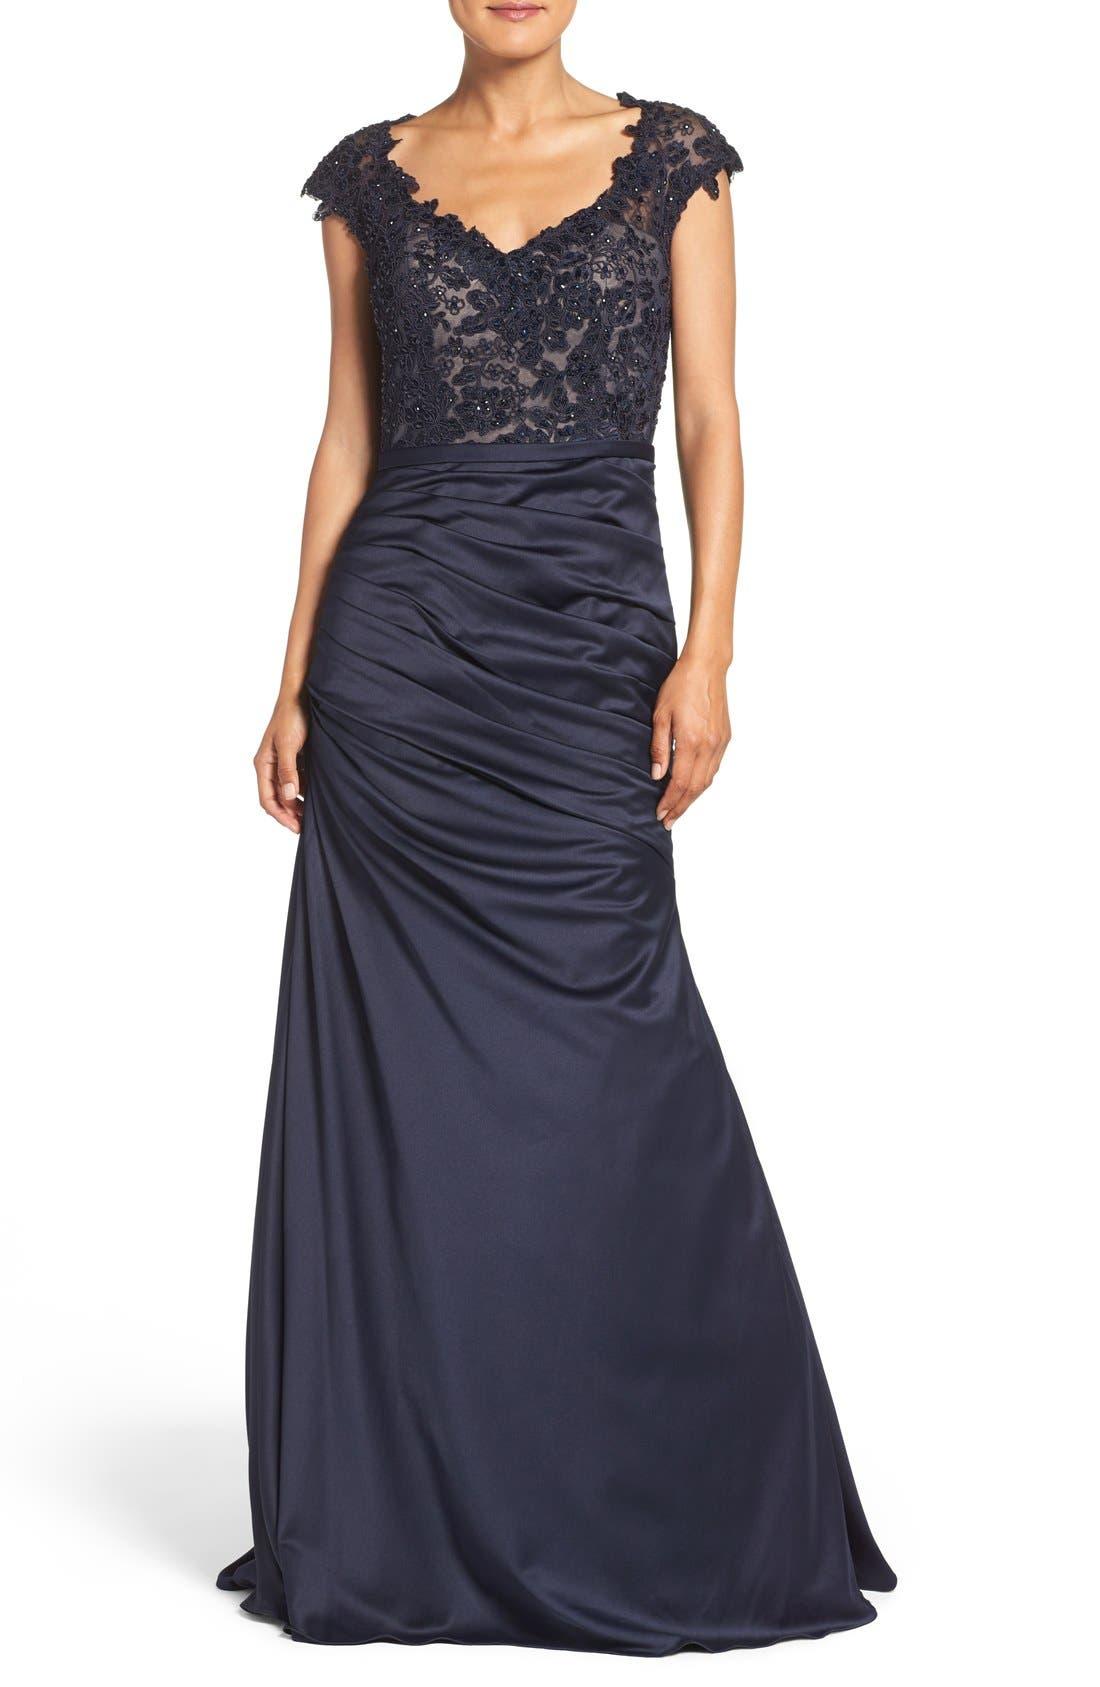 La Femme Embellished Lace & Satin Mermaid Gown